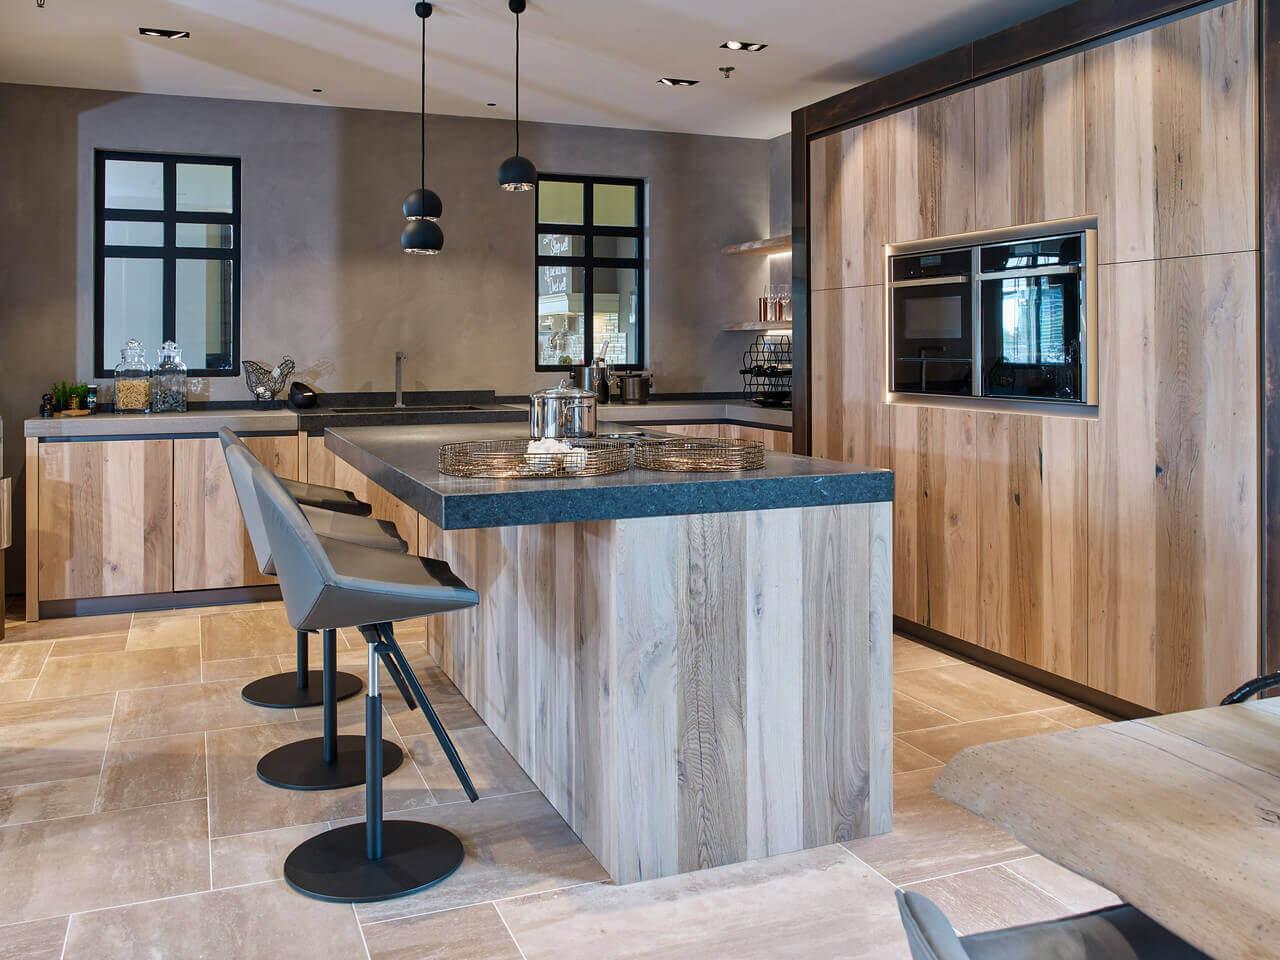 Greeploze keukens van Tieleman keukens